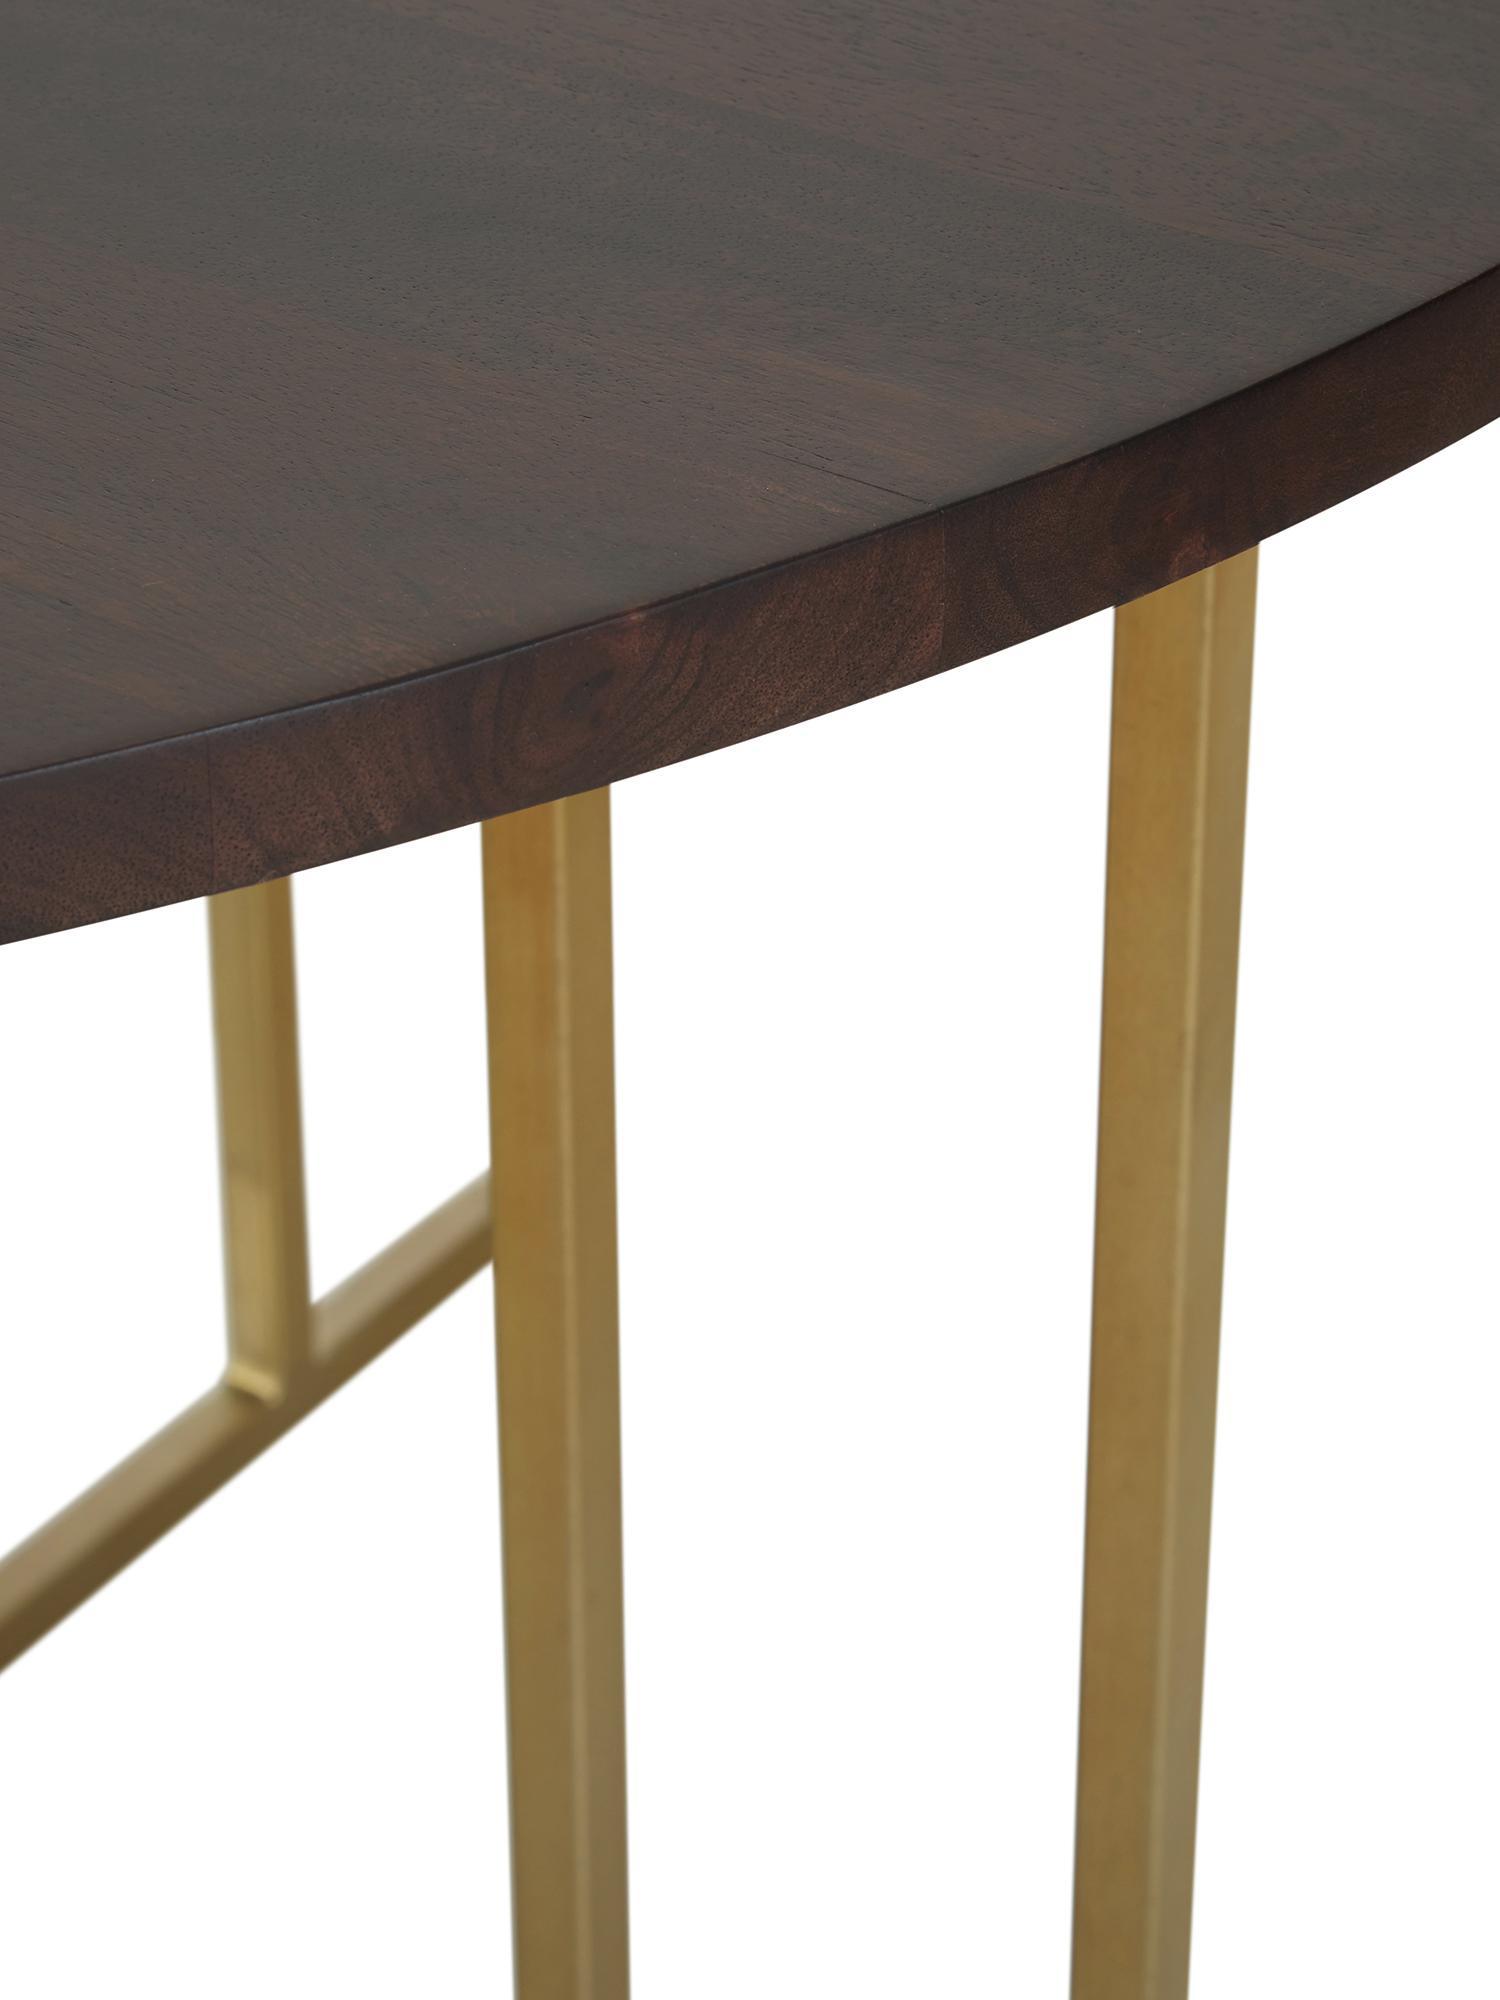 Ronde massief houten eettafel Luca in bruin, Tafelblad: massief mangohout, gebors, Frame: gepoedercoat metaal, Tafelblad: donker gelakt mangohout. Frame: goudkleurig, Ø 120 x H 75 cm